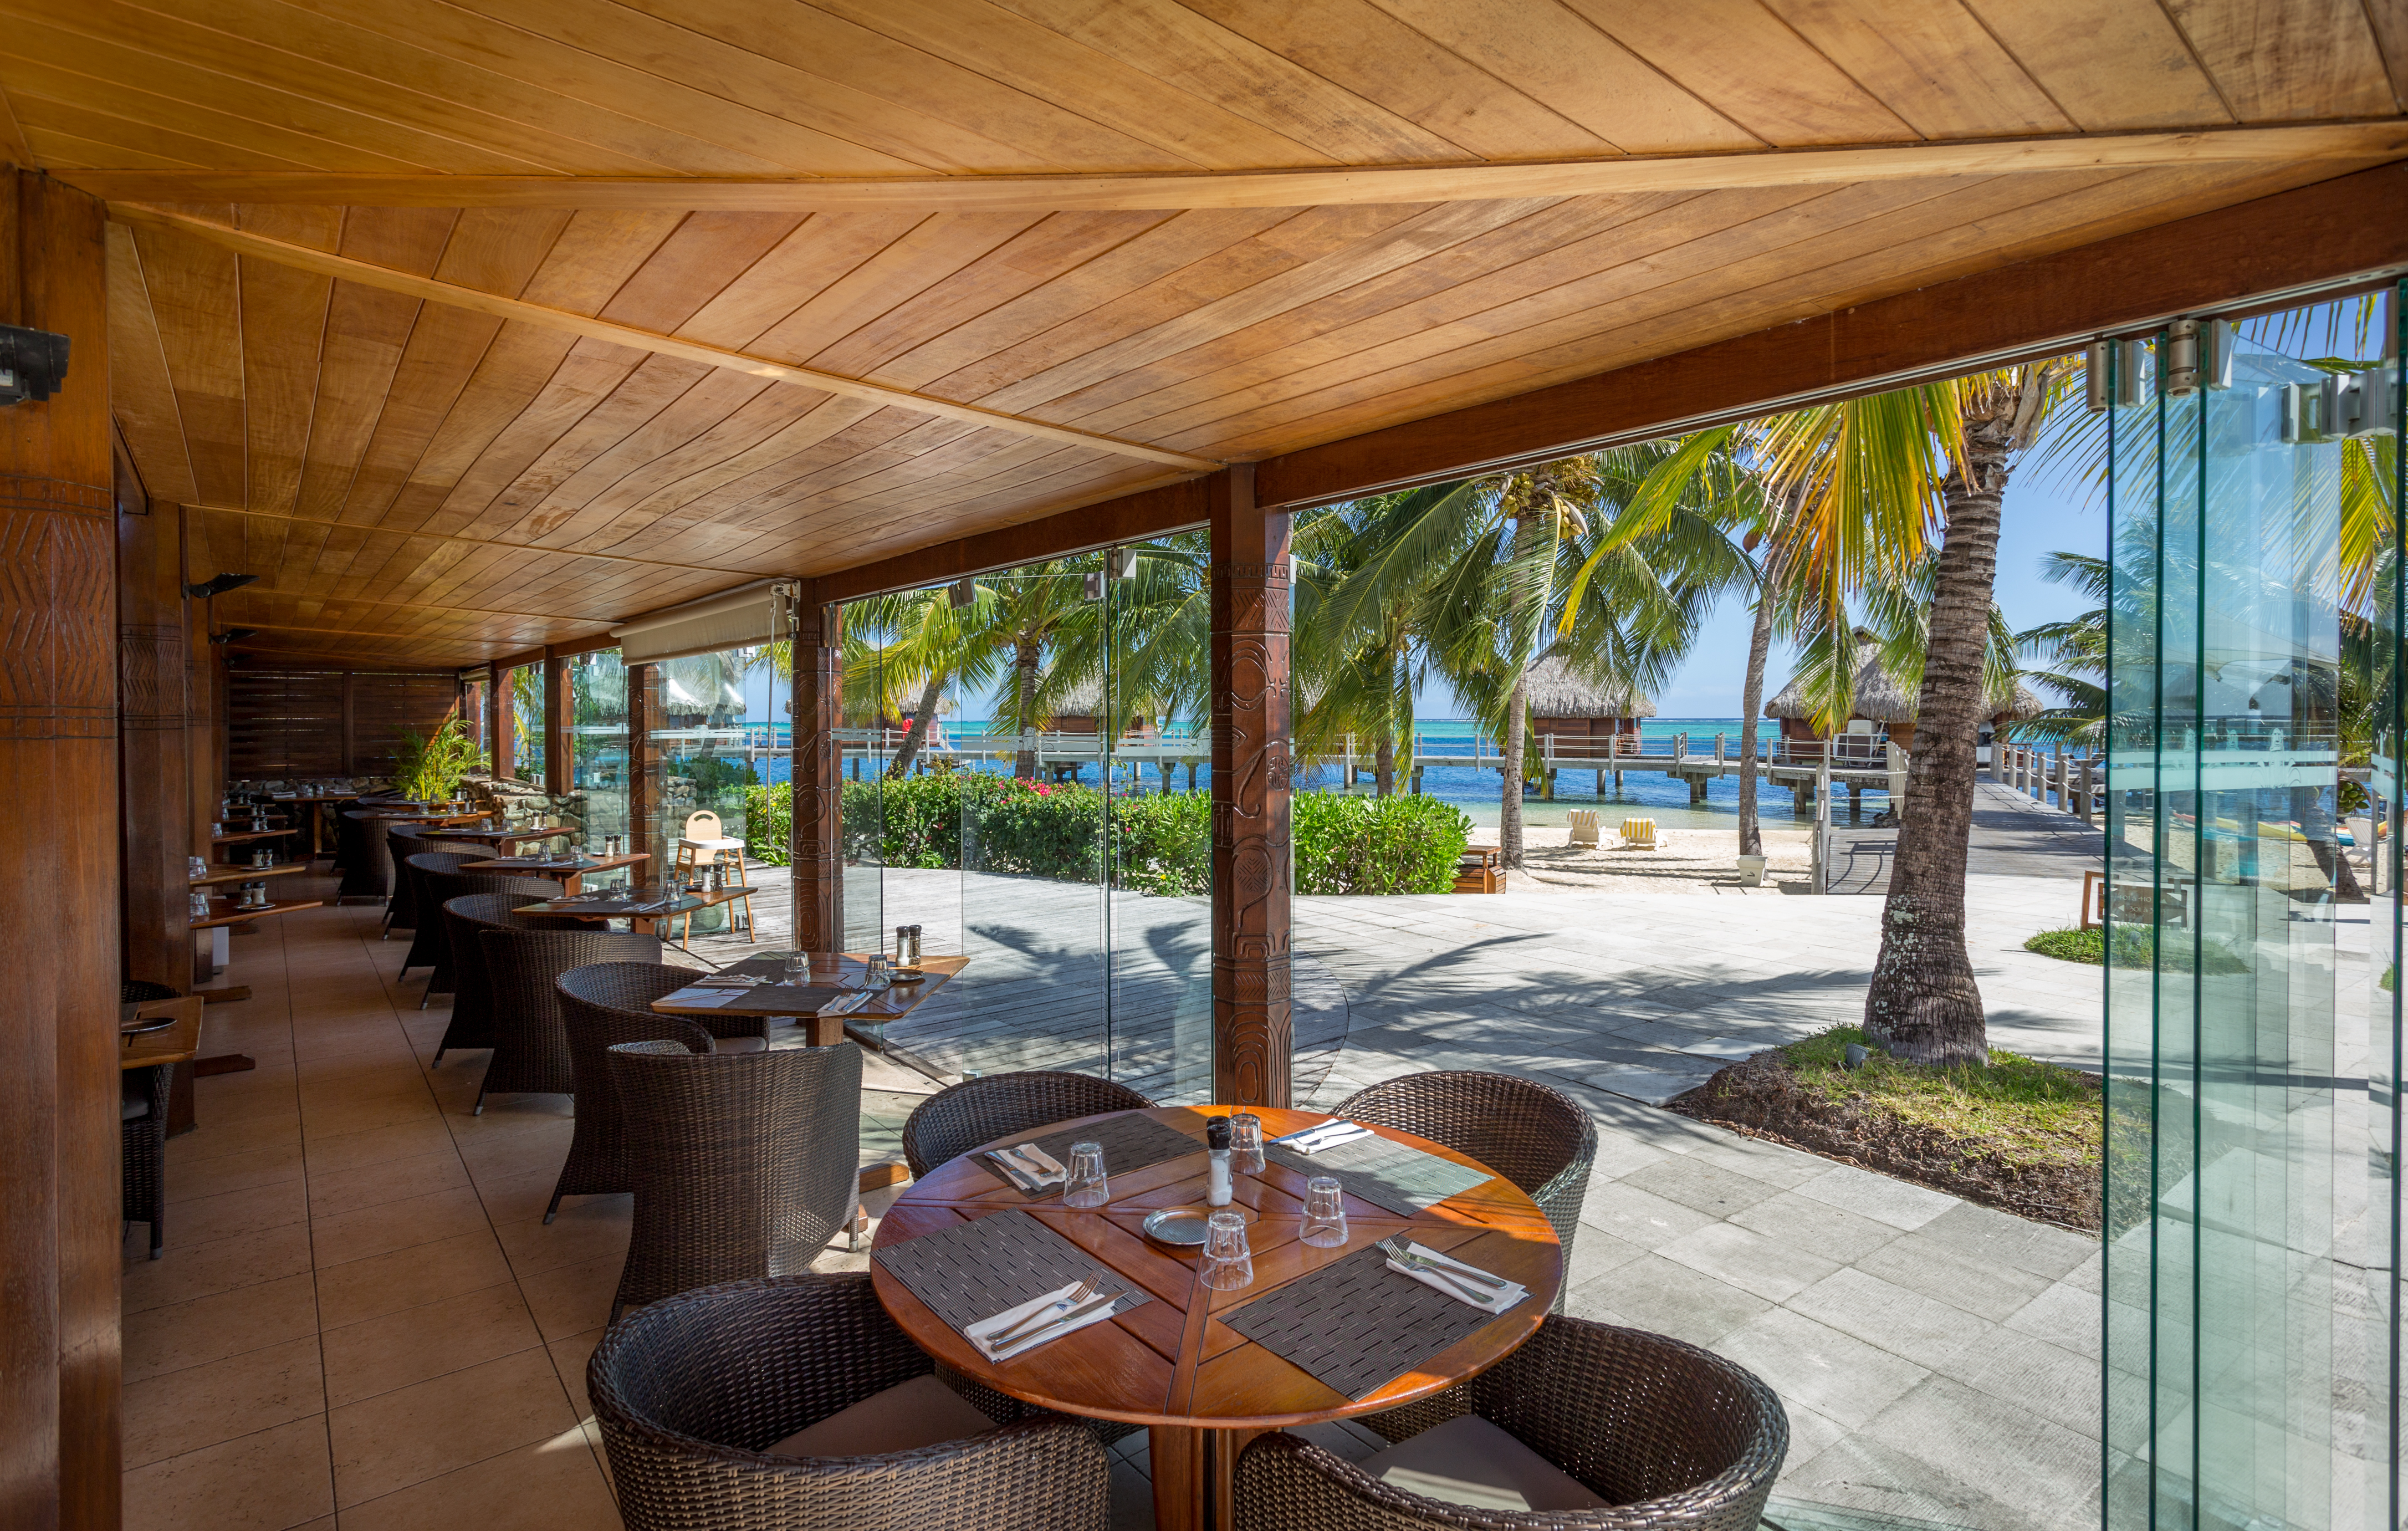 https://tahititourisme.fr/wp-content/uploads/2018/03/RESTAURATION-Restaurant-Mahanai-1-Charles_Veronese.jpg